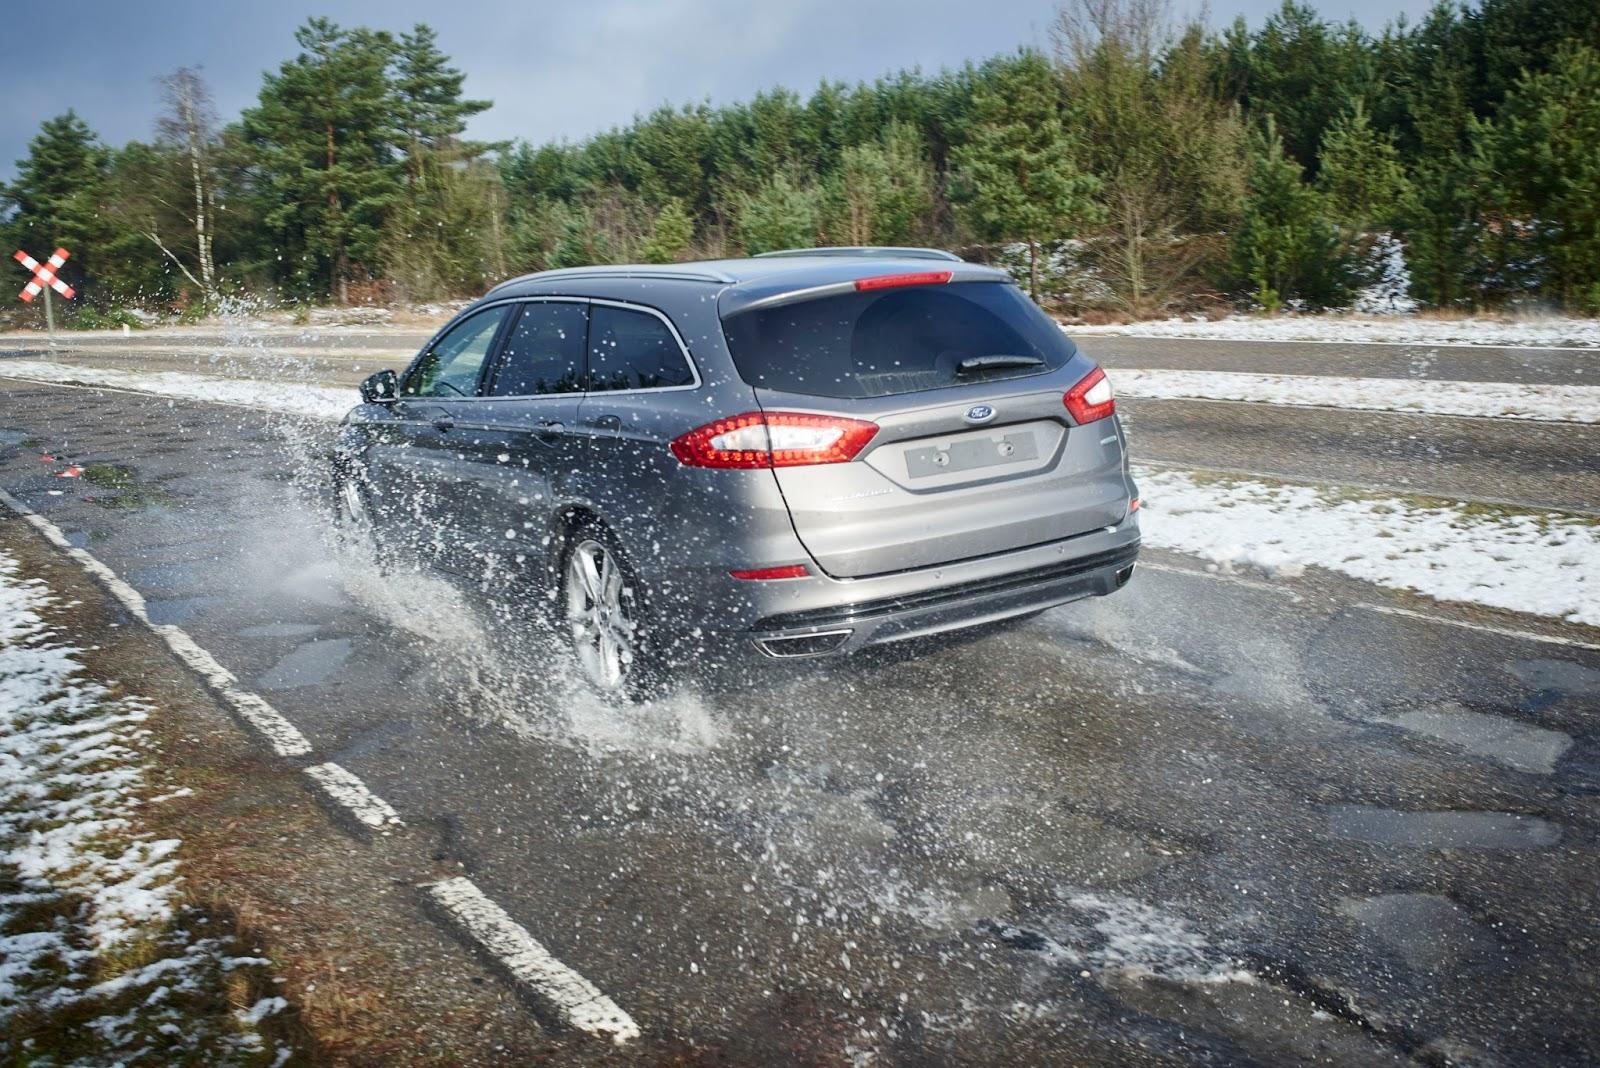 FORD2017 Pothole 4 Η Ford χαρτογραφεί τις λακκούβες Ford, Innovation, τεχνικά, Τεχνολογία